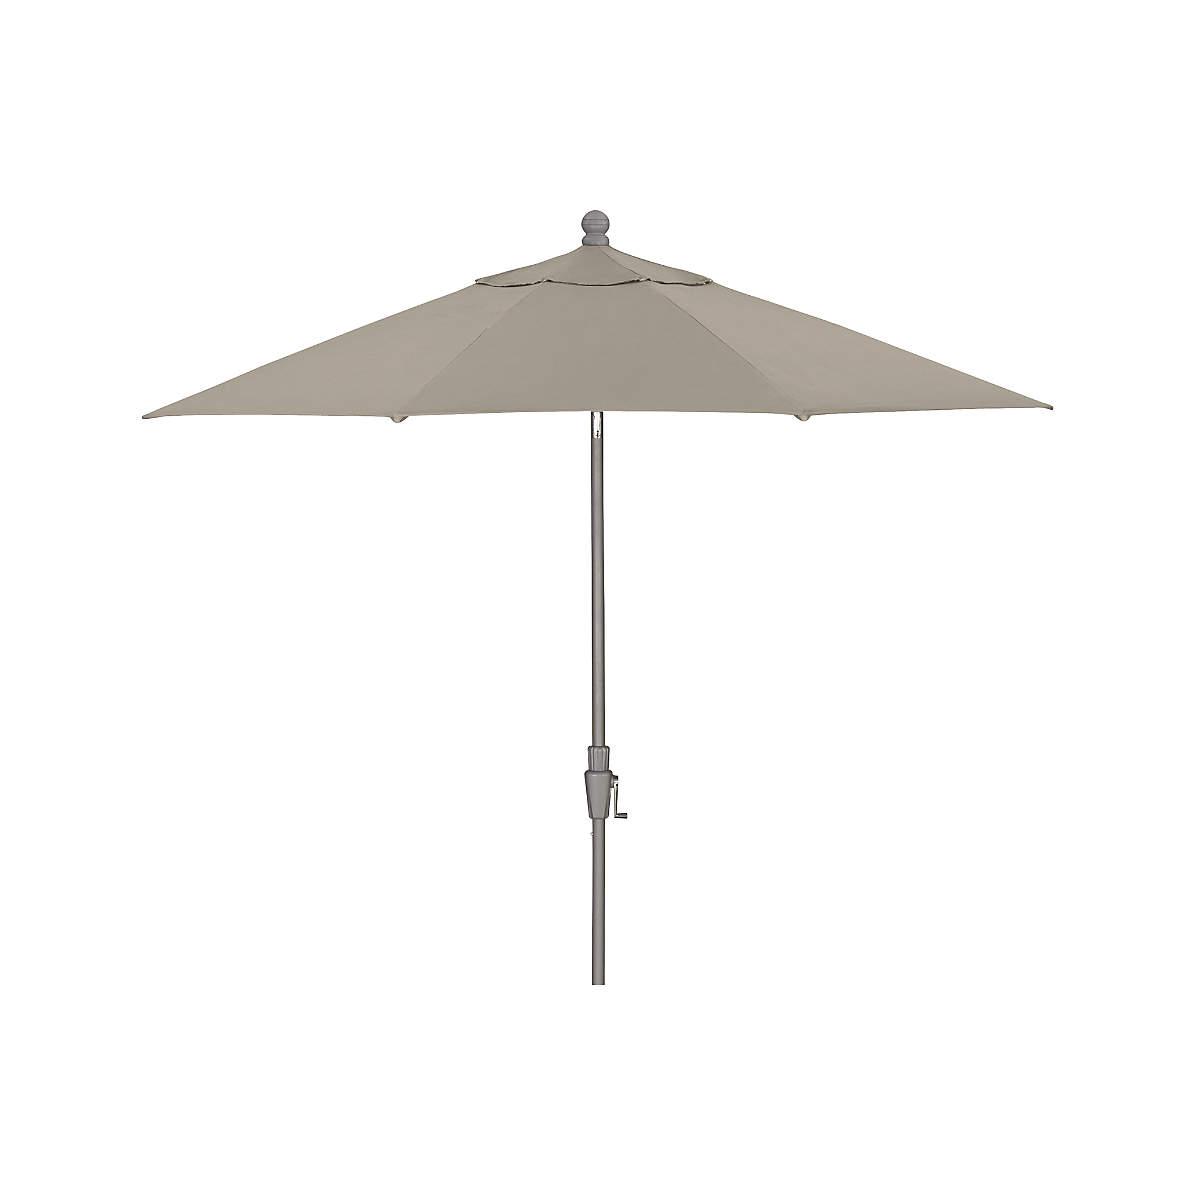 tilting outdoor umbrella by sunbrella